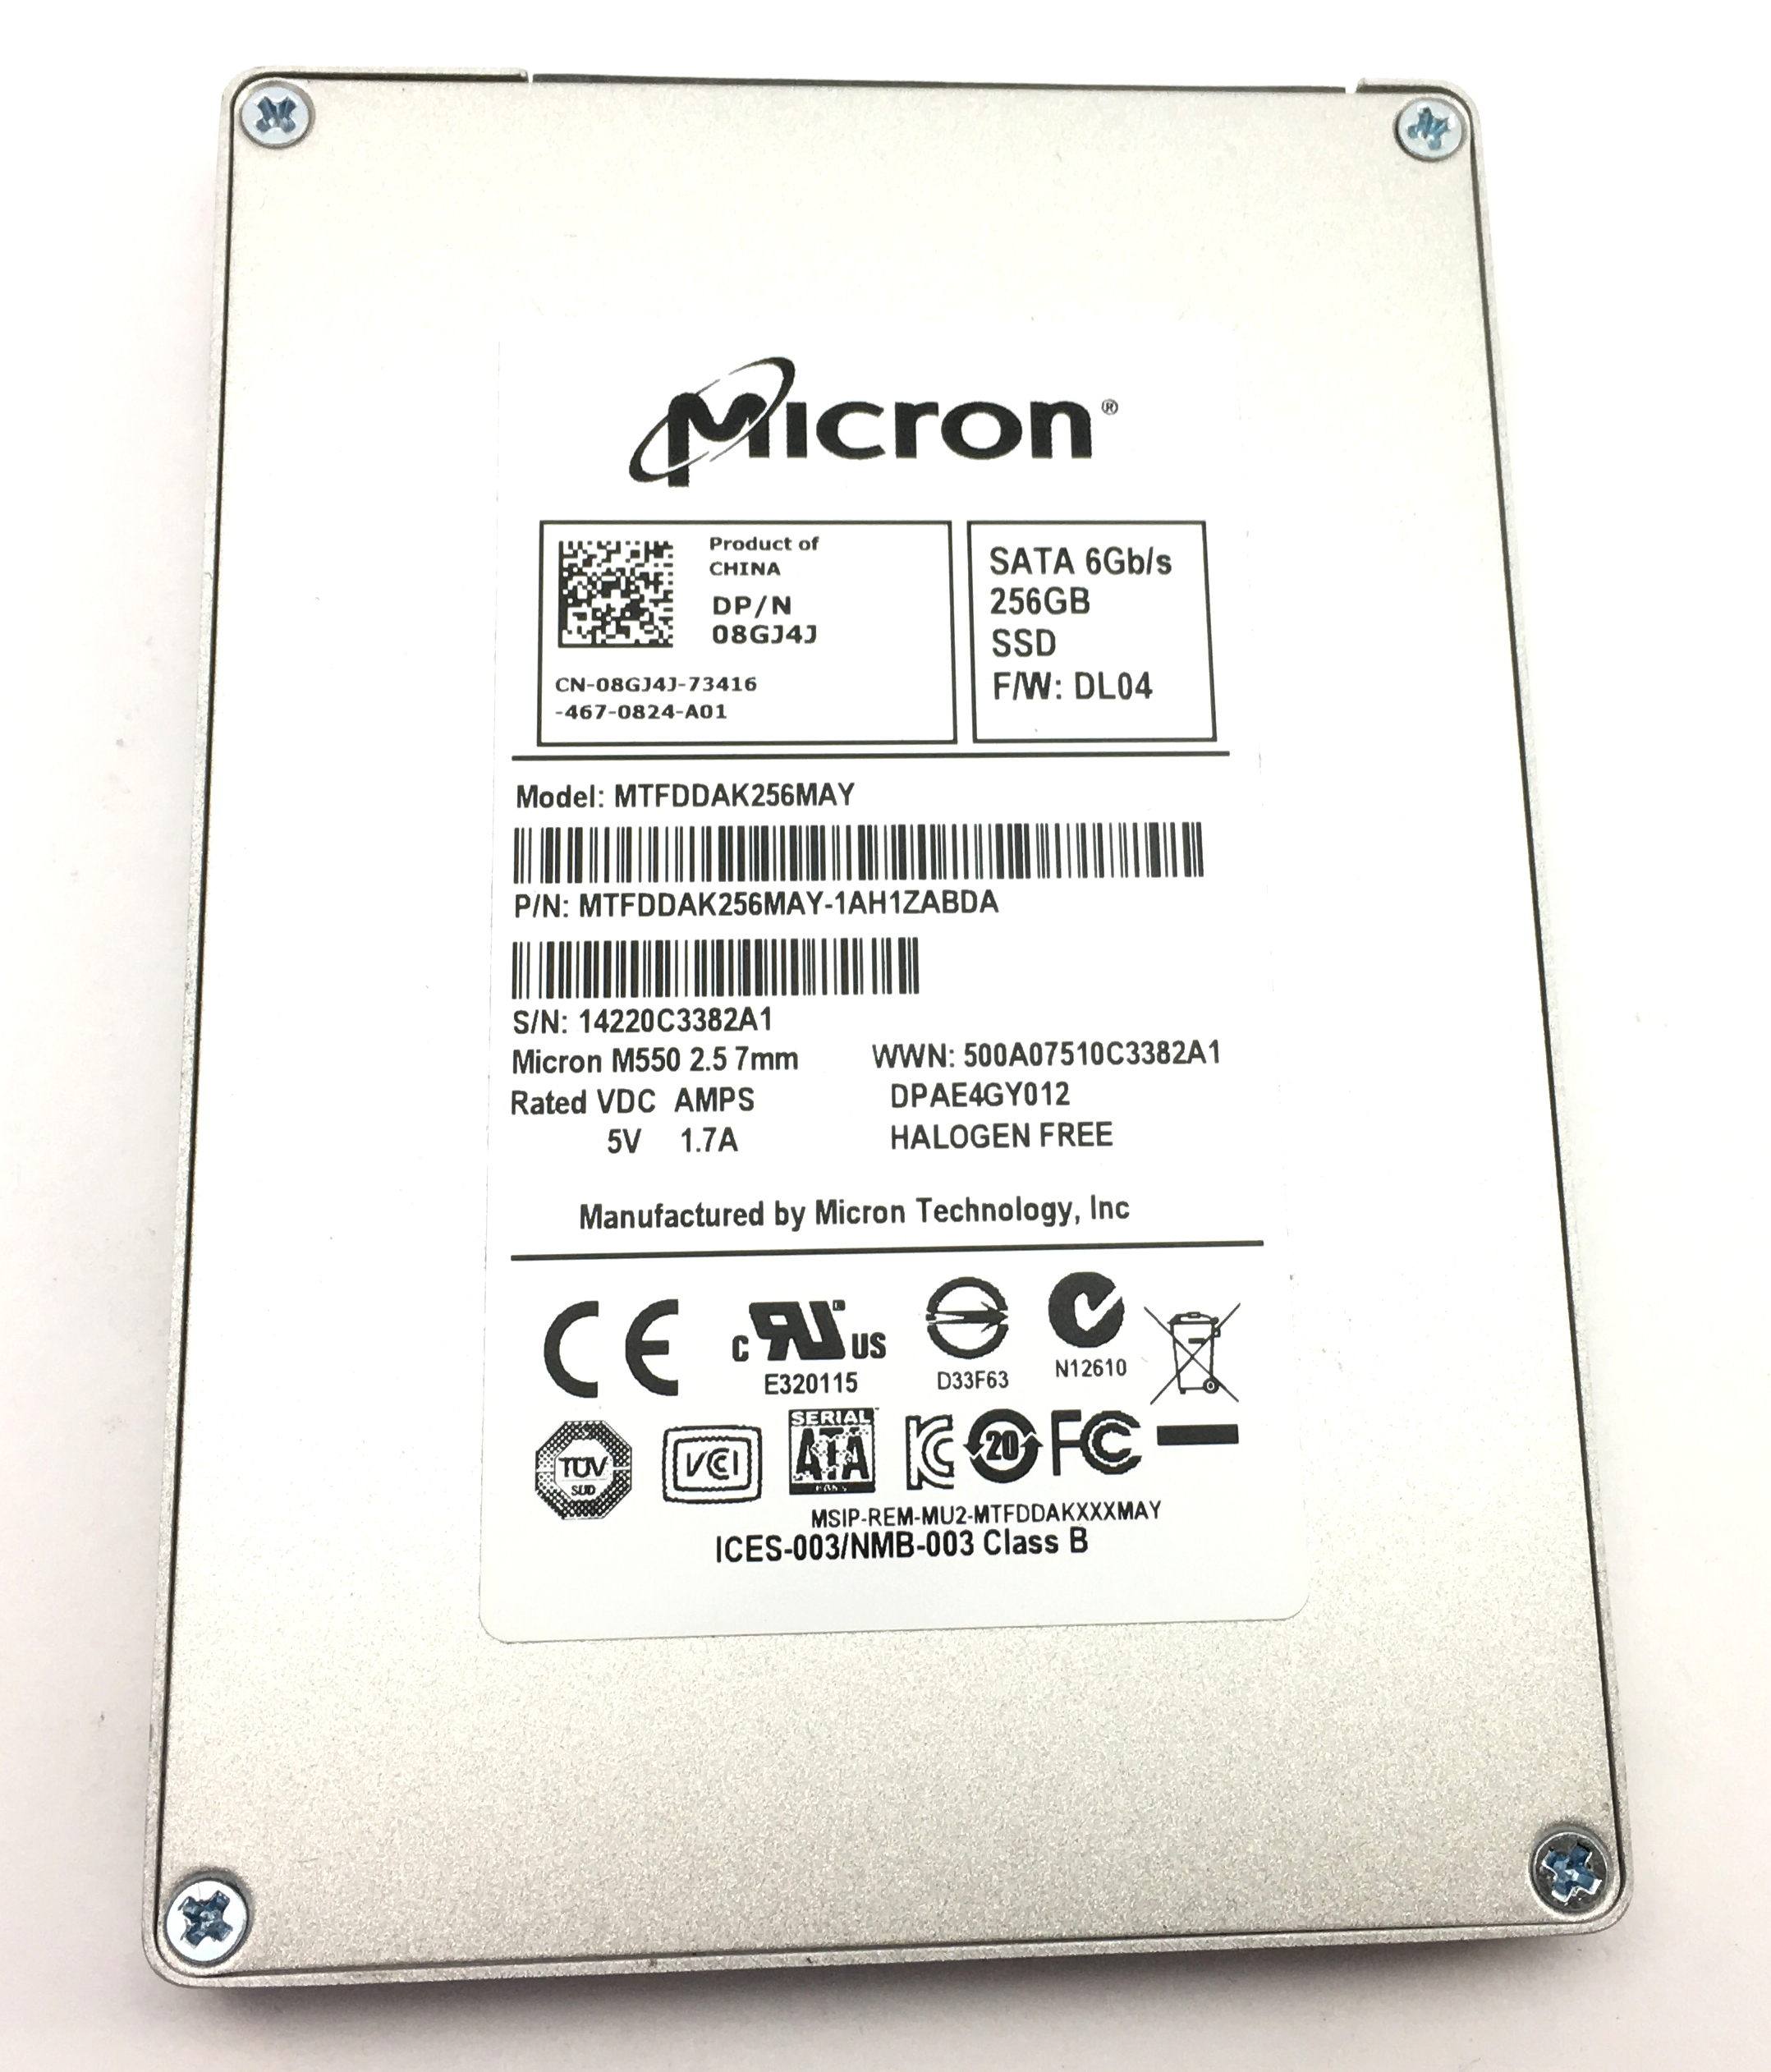 Dell Micron M550 256GB 6Gbps SATA SSD Solid State Drive (8GJ4J)